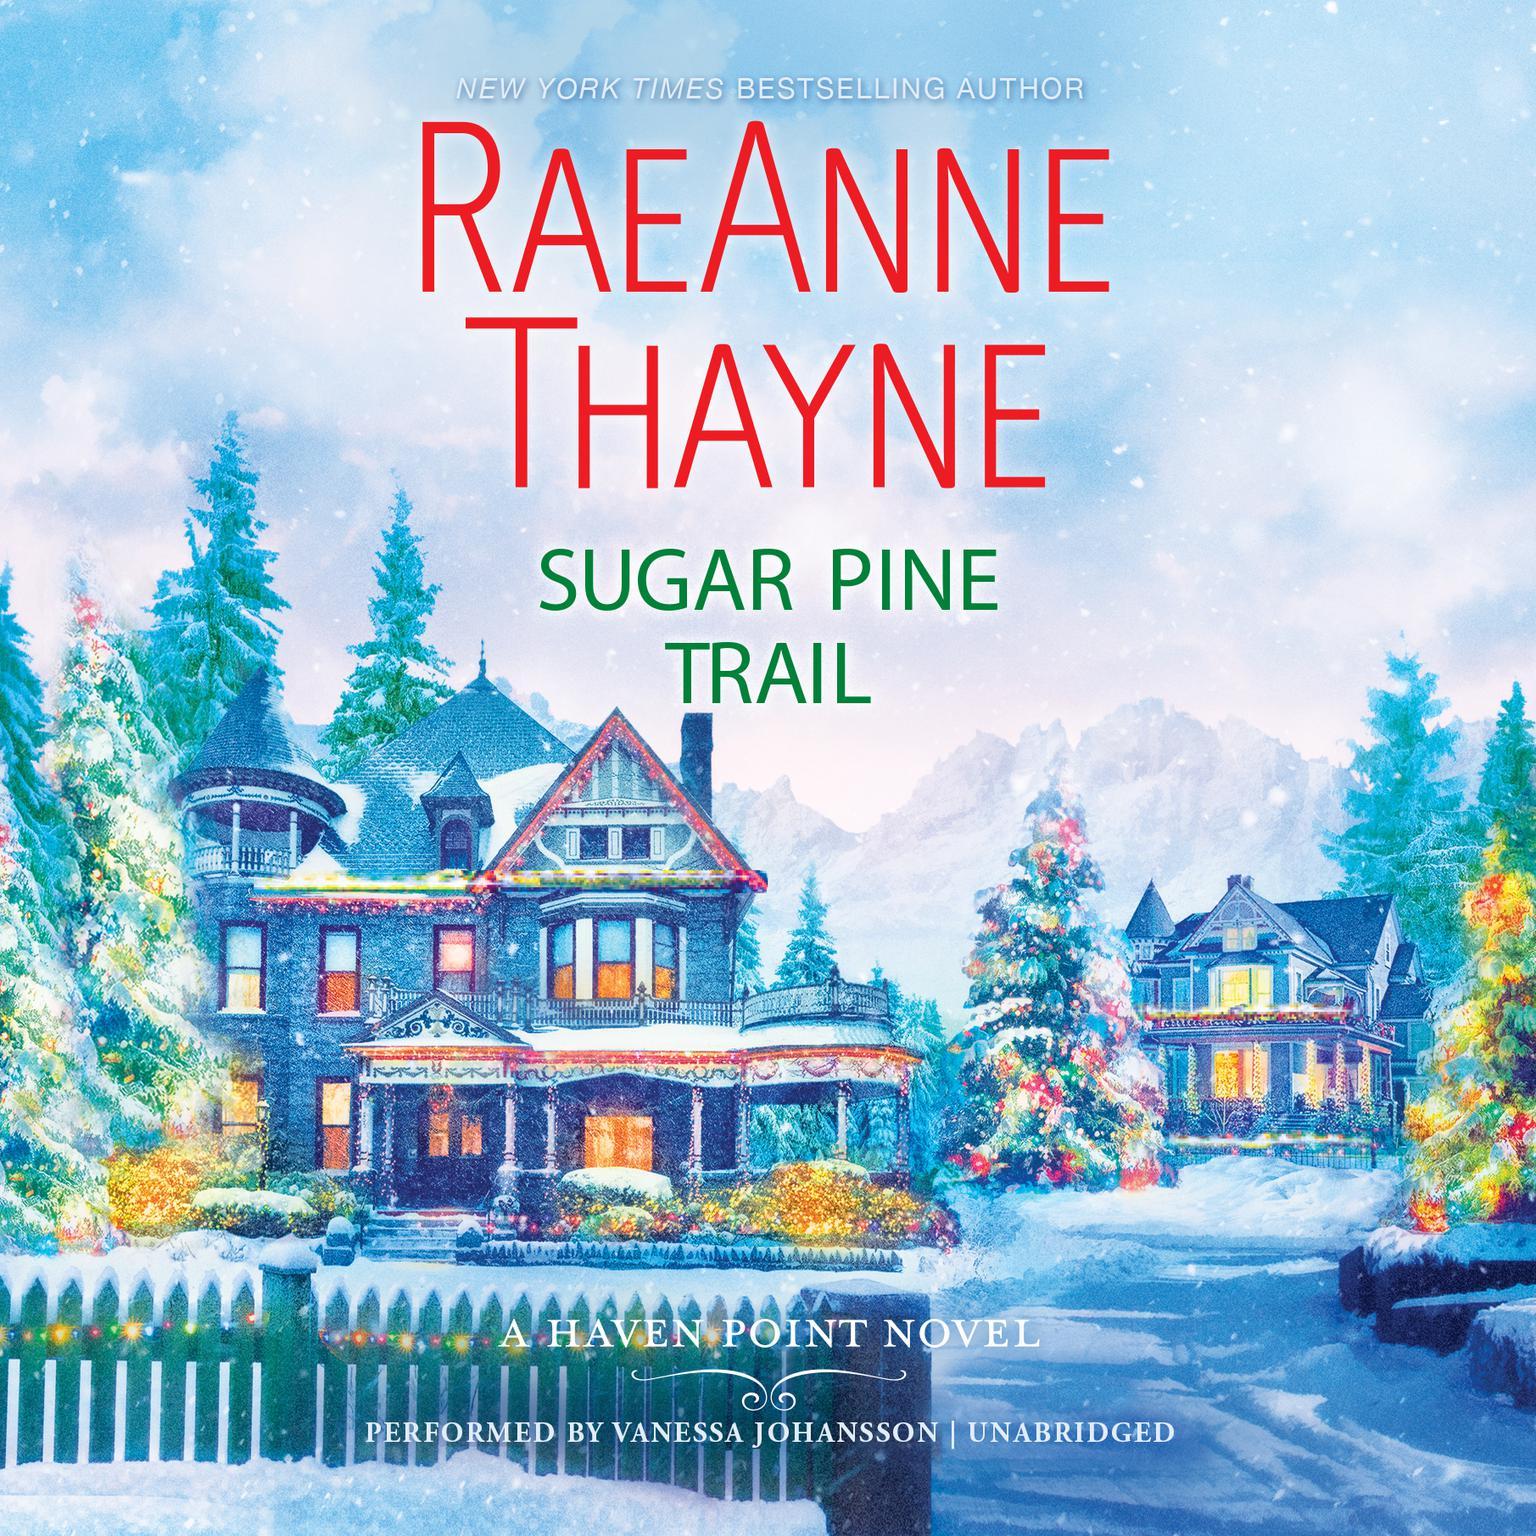 Sugar Pine Trail: Haven Point Audiobook, by RaeAnne Thayne